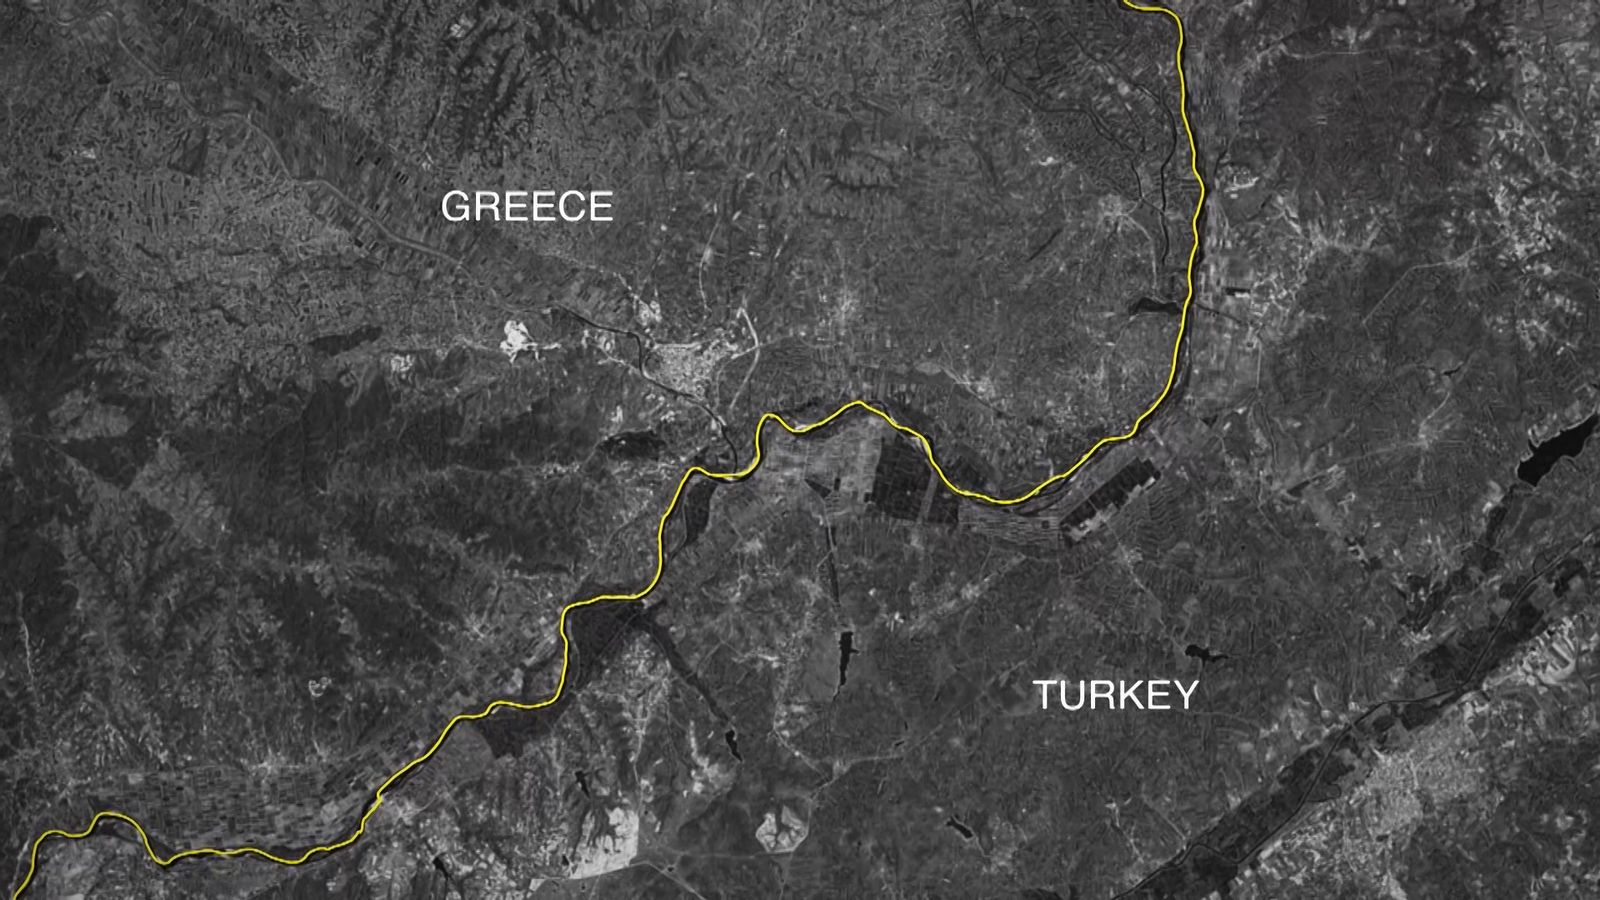 EINMALIGE VERWENDUNG SCREENSHOT/ Griechenland/ Push-Backs